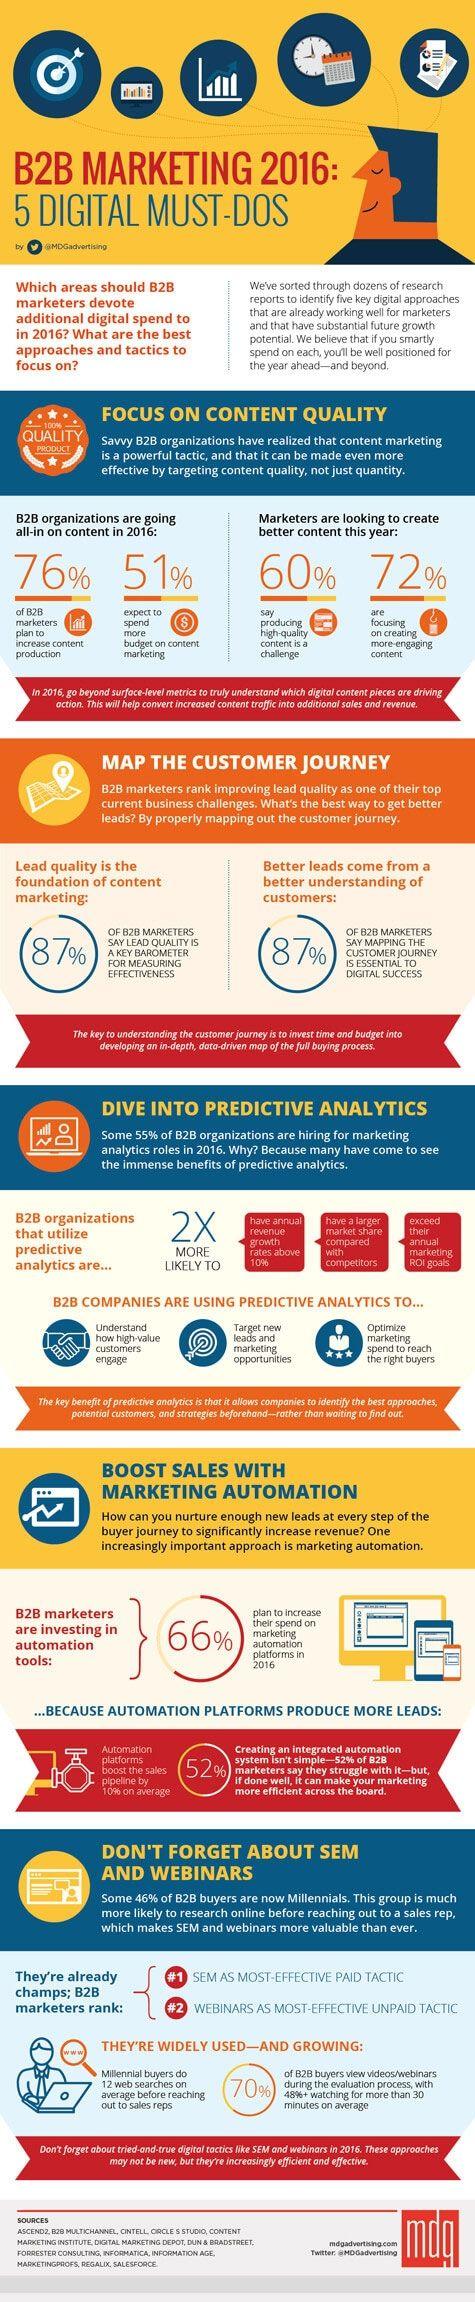 B2B Marketing 2016 - 5 Digital Must-Dos - Infographic of the week: Digital marketing